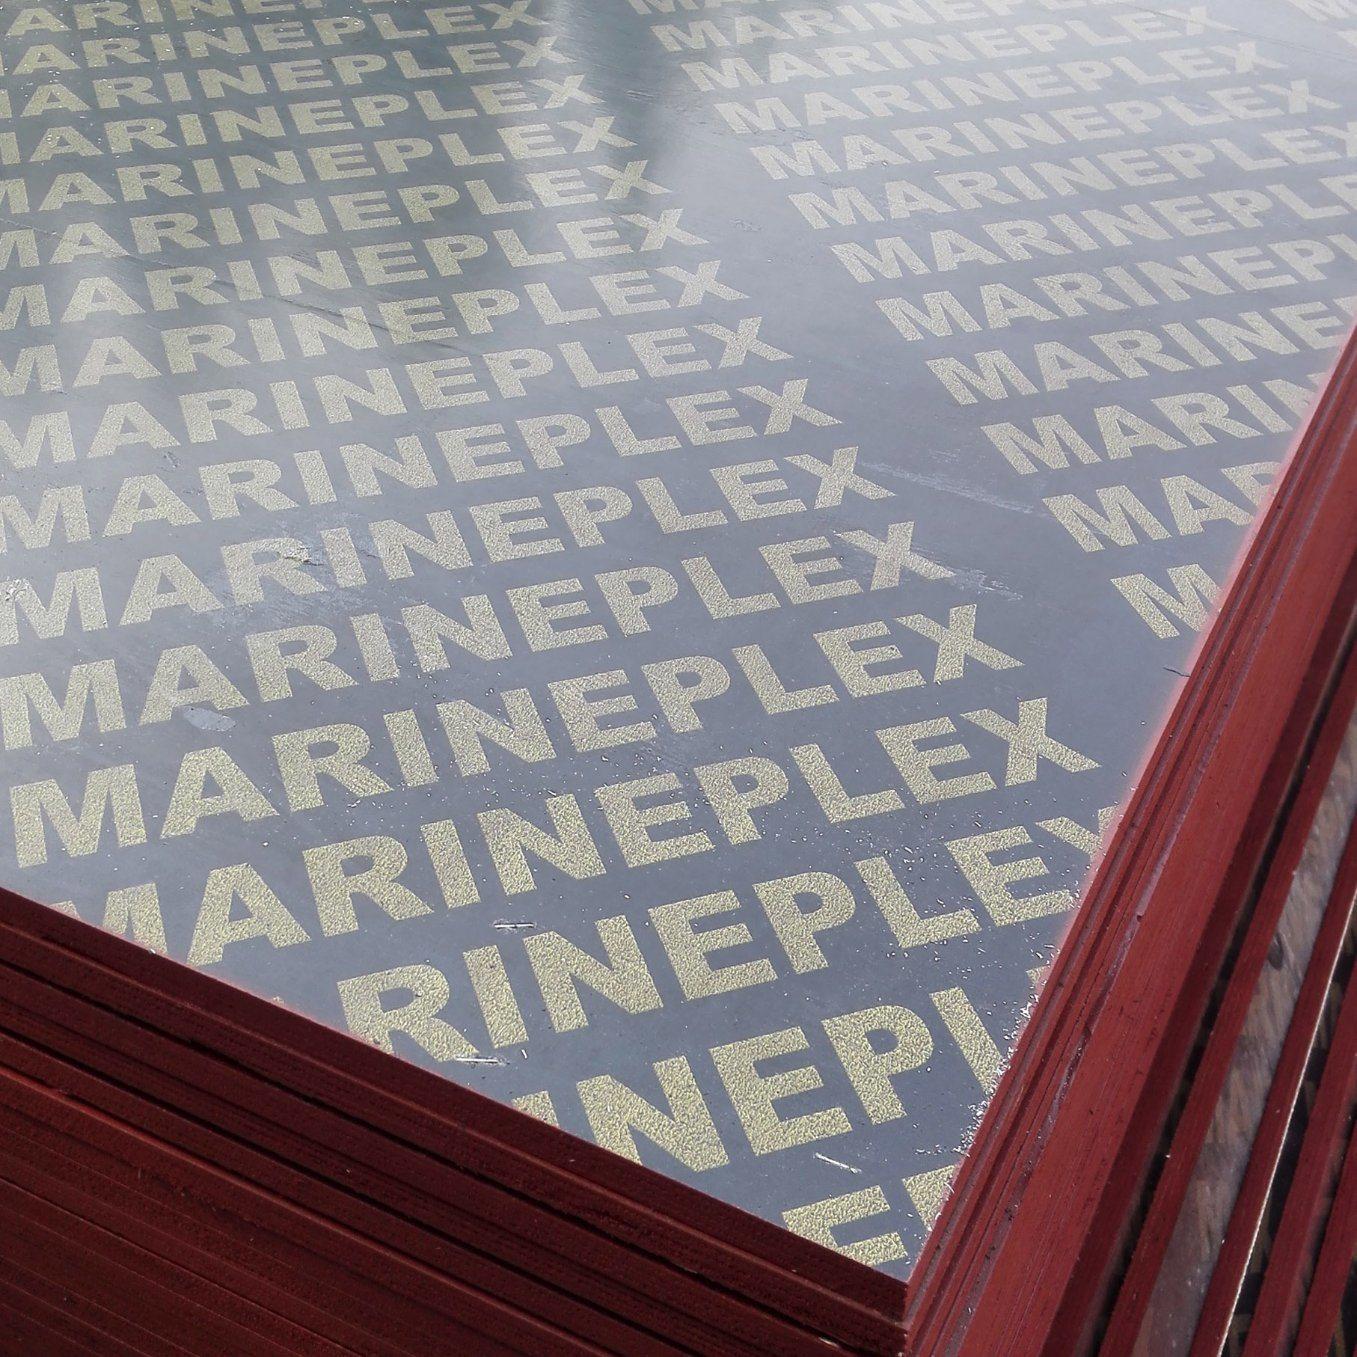 WBP Glue 18mm Phenolic Board Marine Plywood for Philippines Market